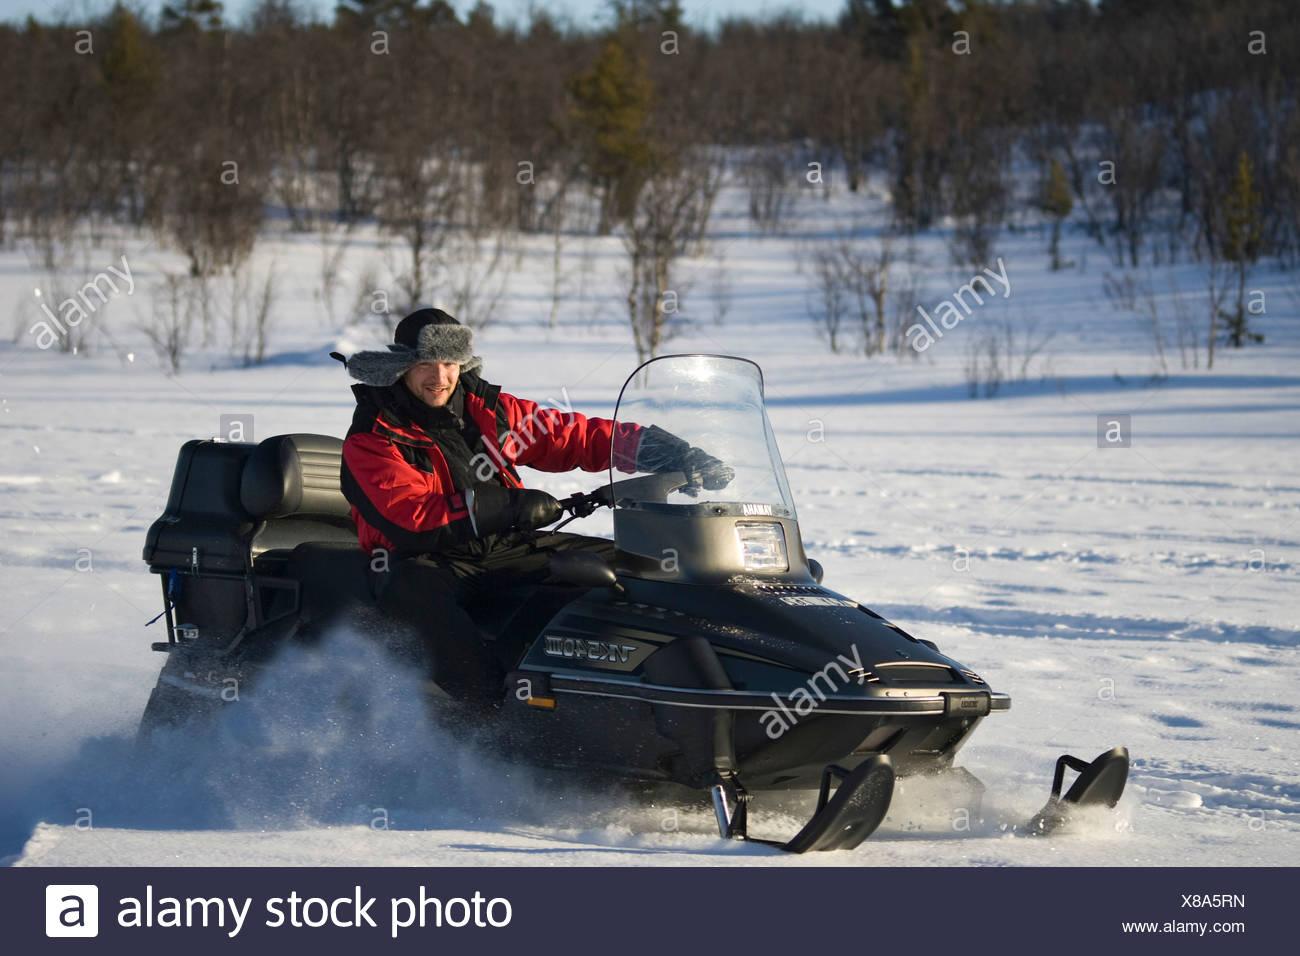 A snowmobile rider in Kiruna, North Sweden, Sweden - Stock Image